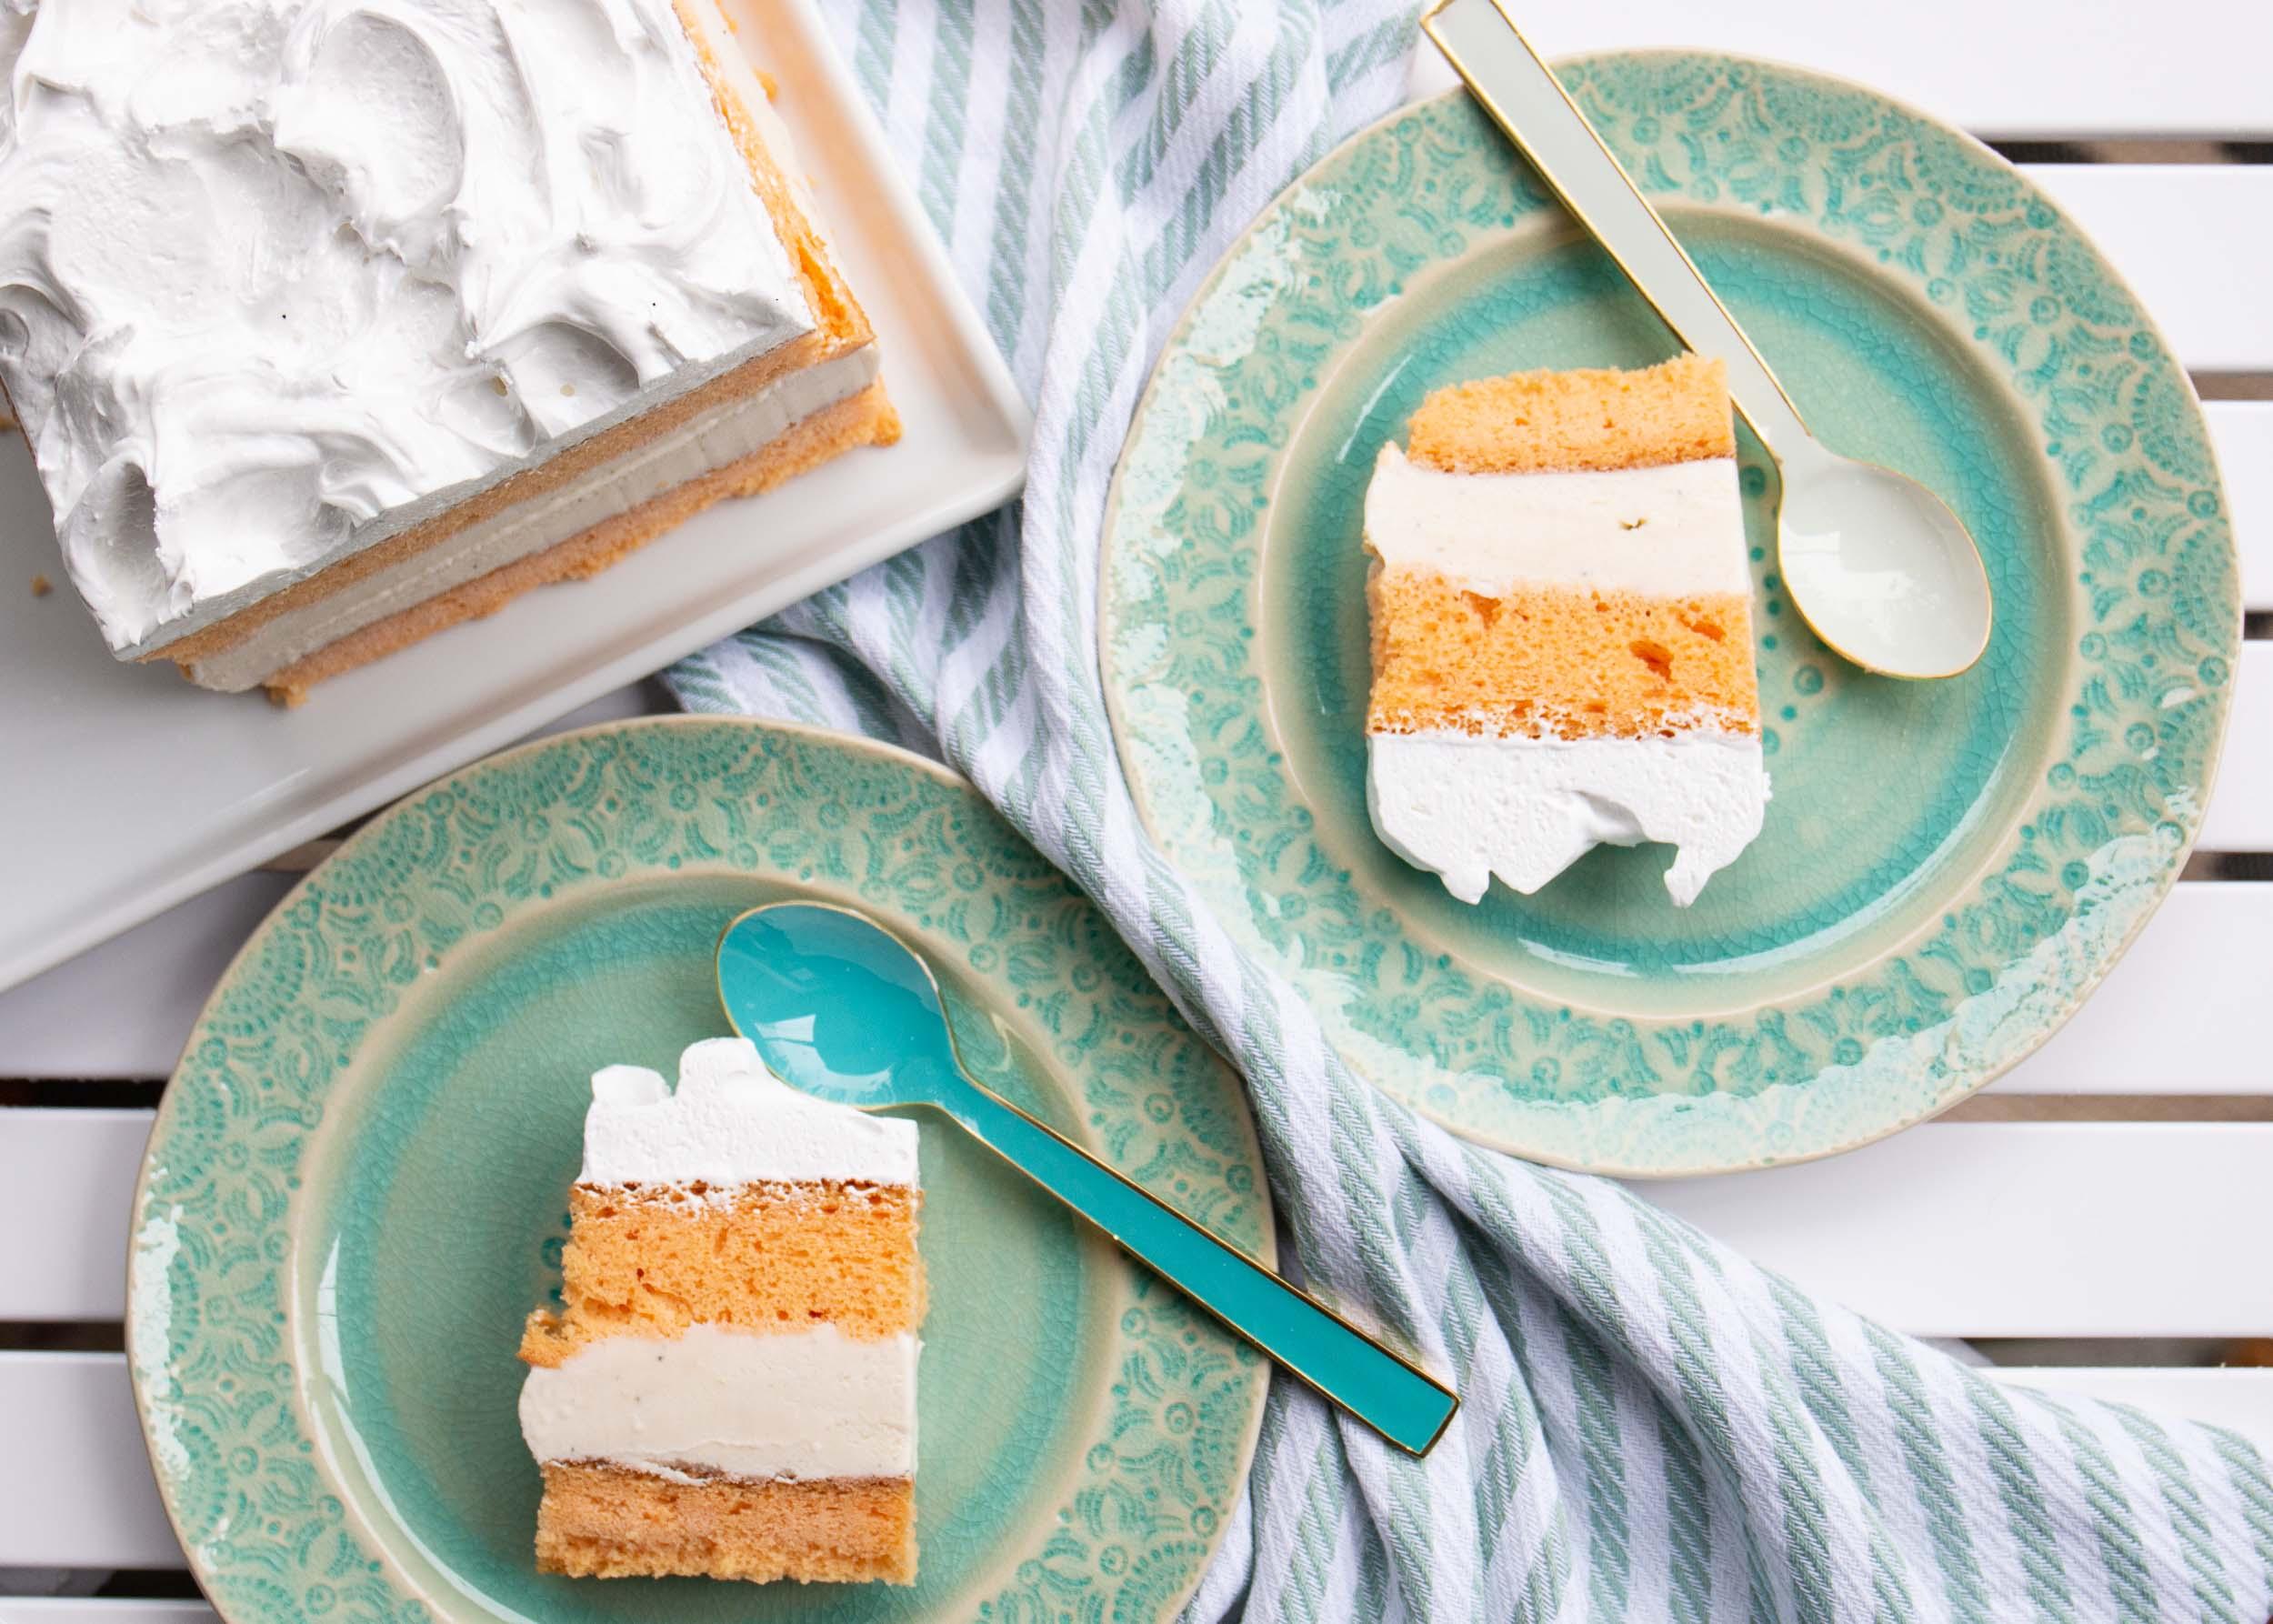 Creamsicle® Ice Cream Cake